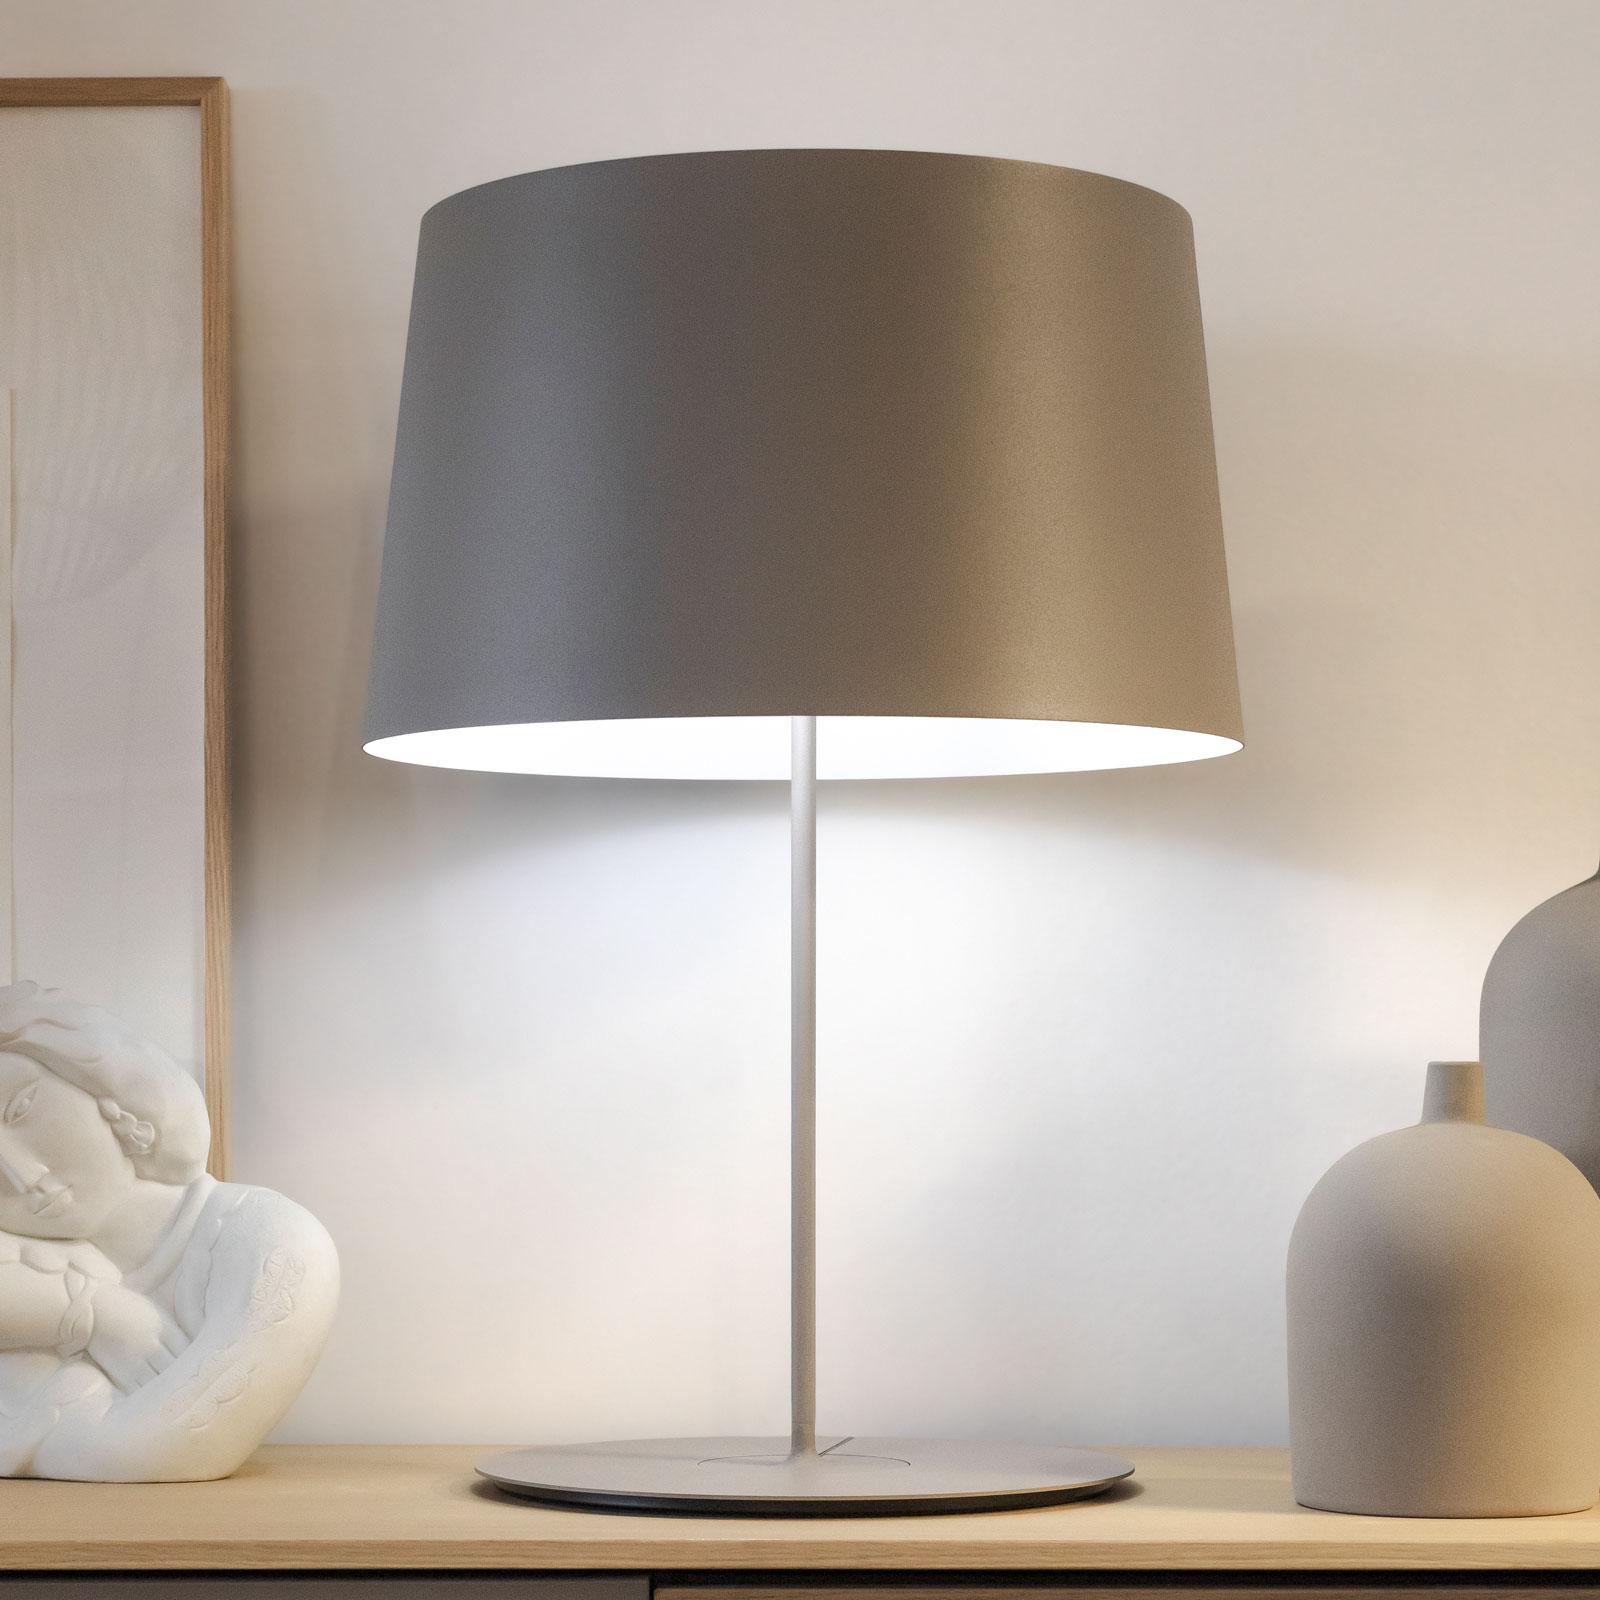 Vibia Warm 4901 pöytälamppu, Ø 42 cm, beige